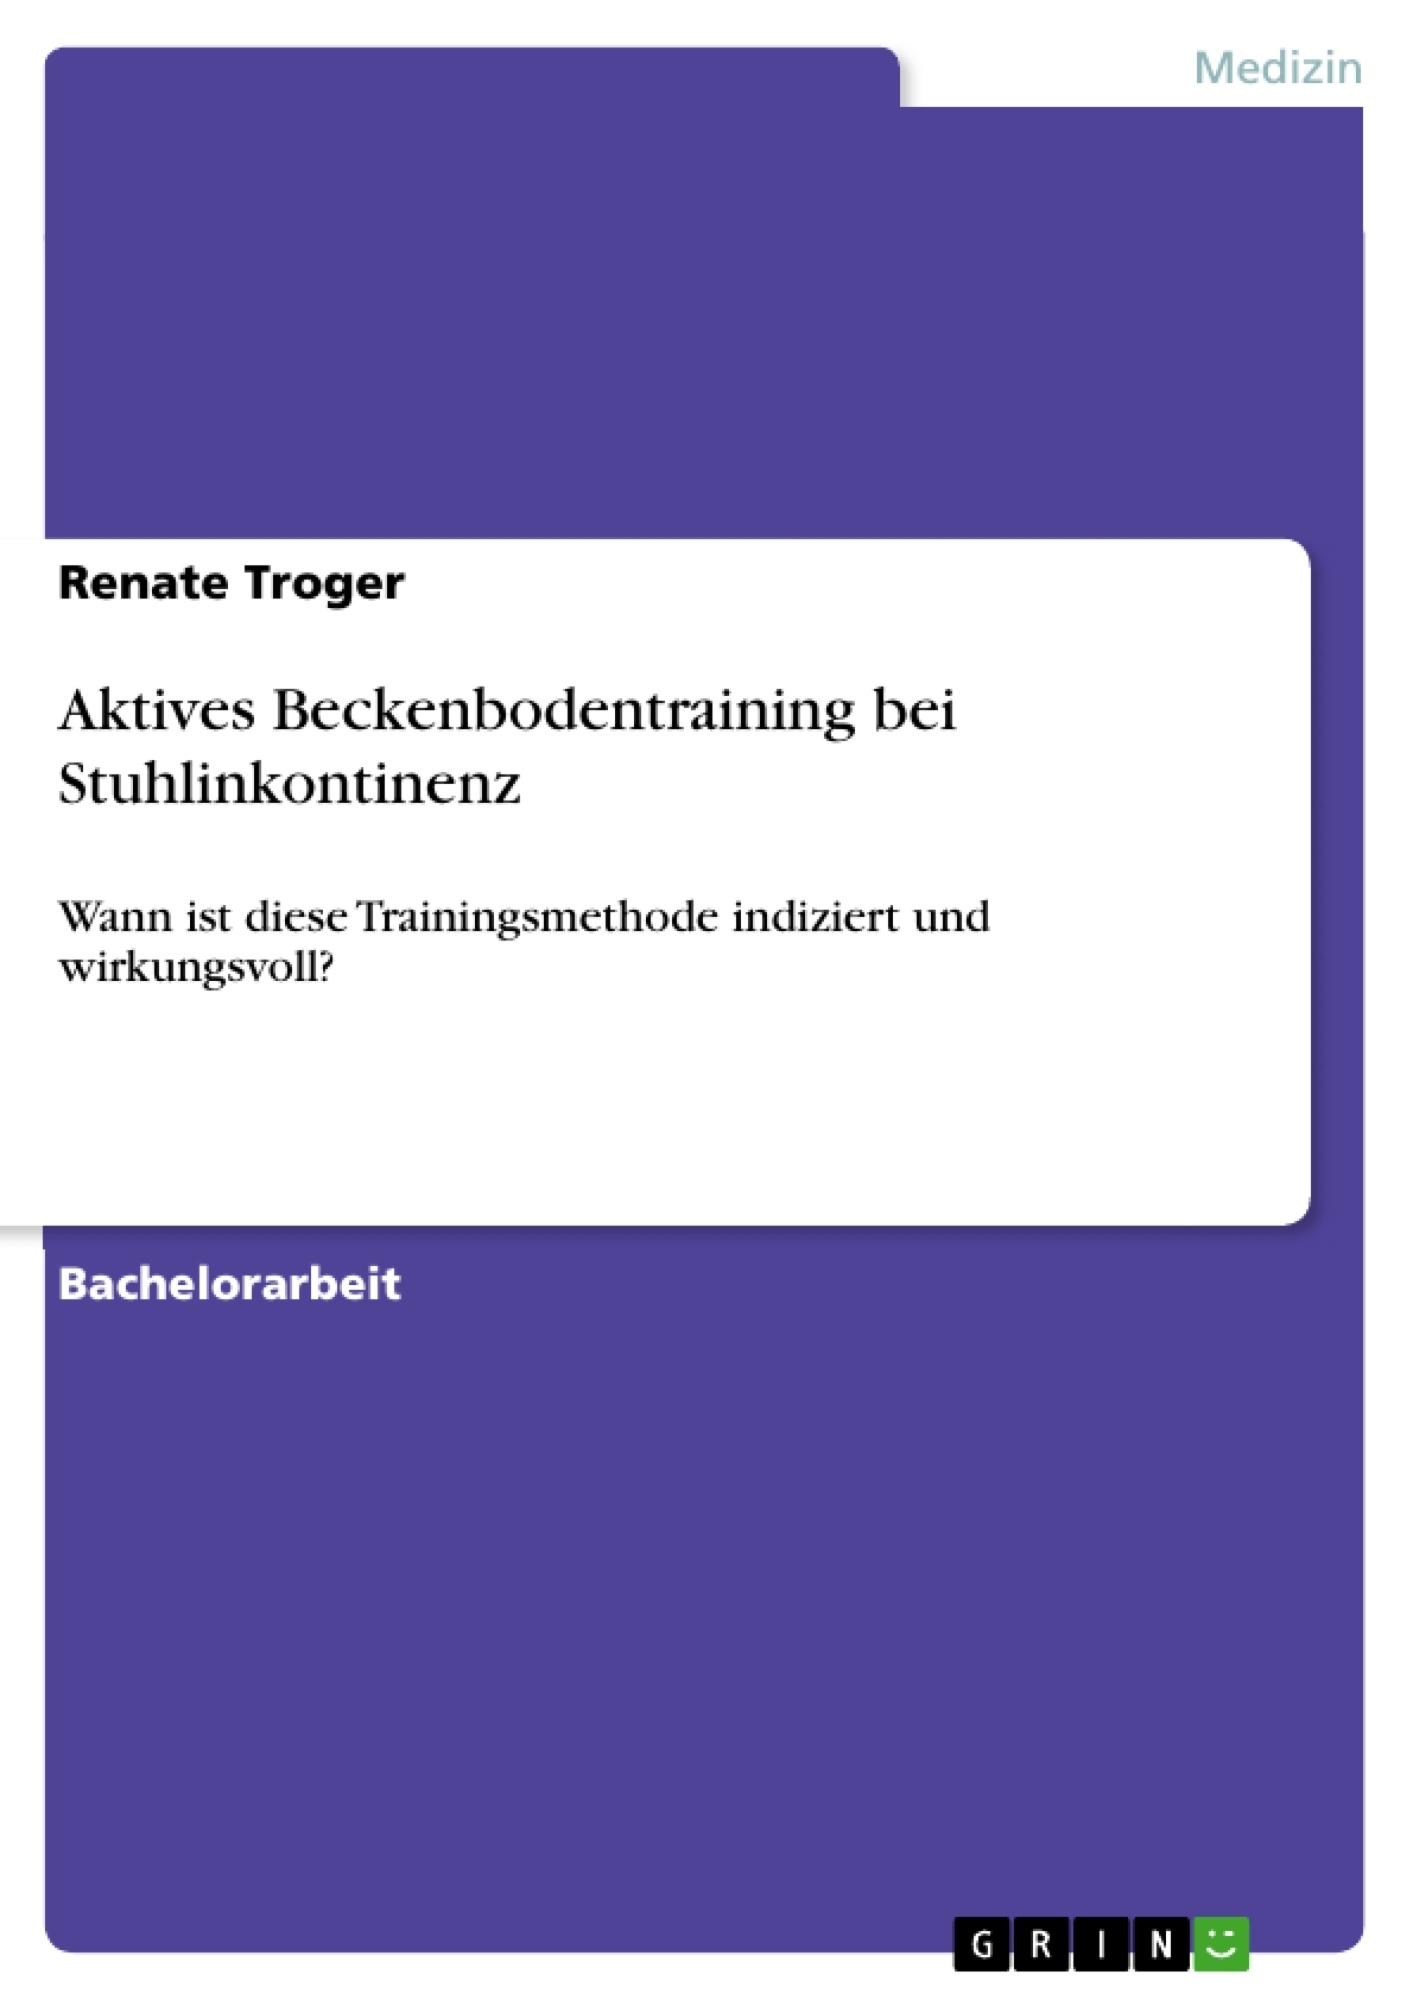 Titel: Aktives Beckenbodentraining bei Stuhlinkontinenz